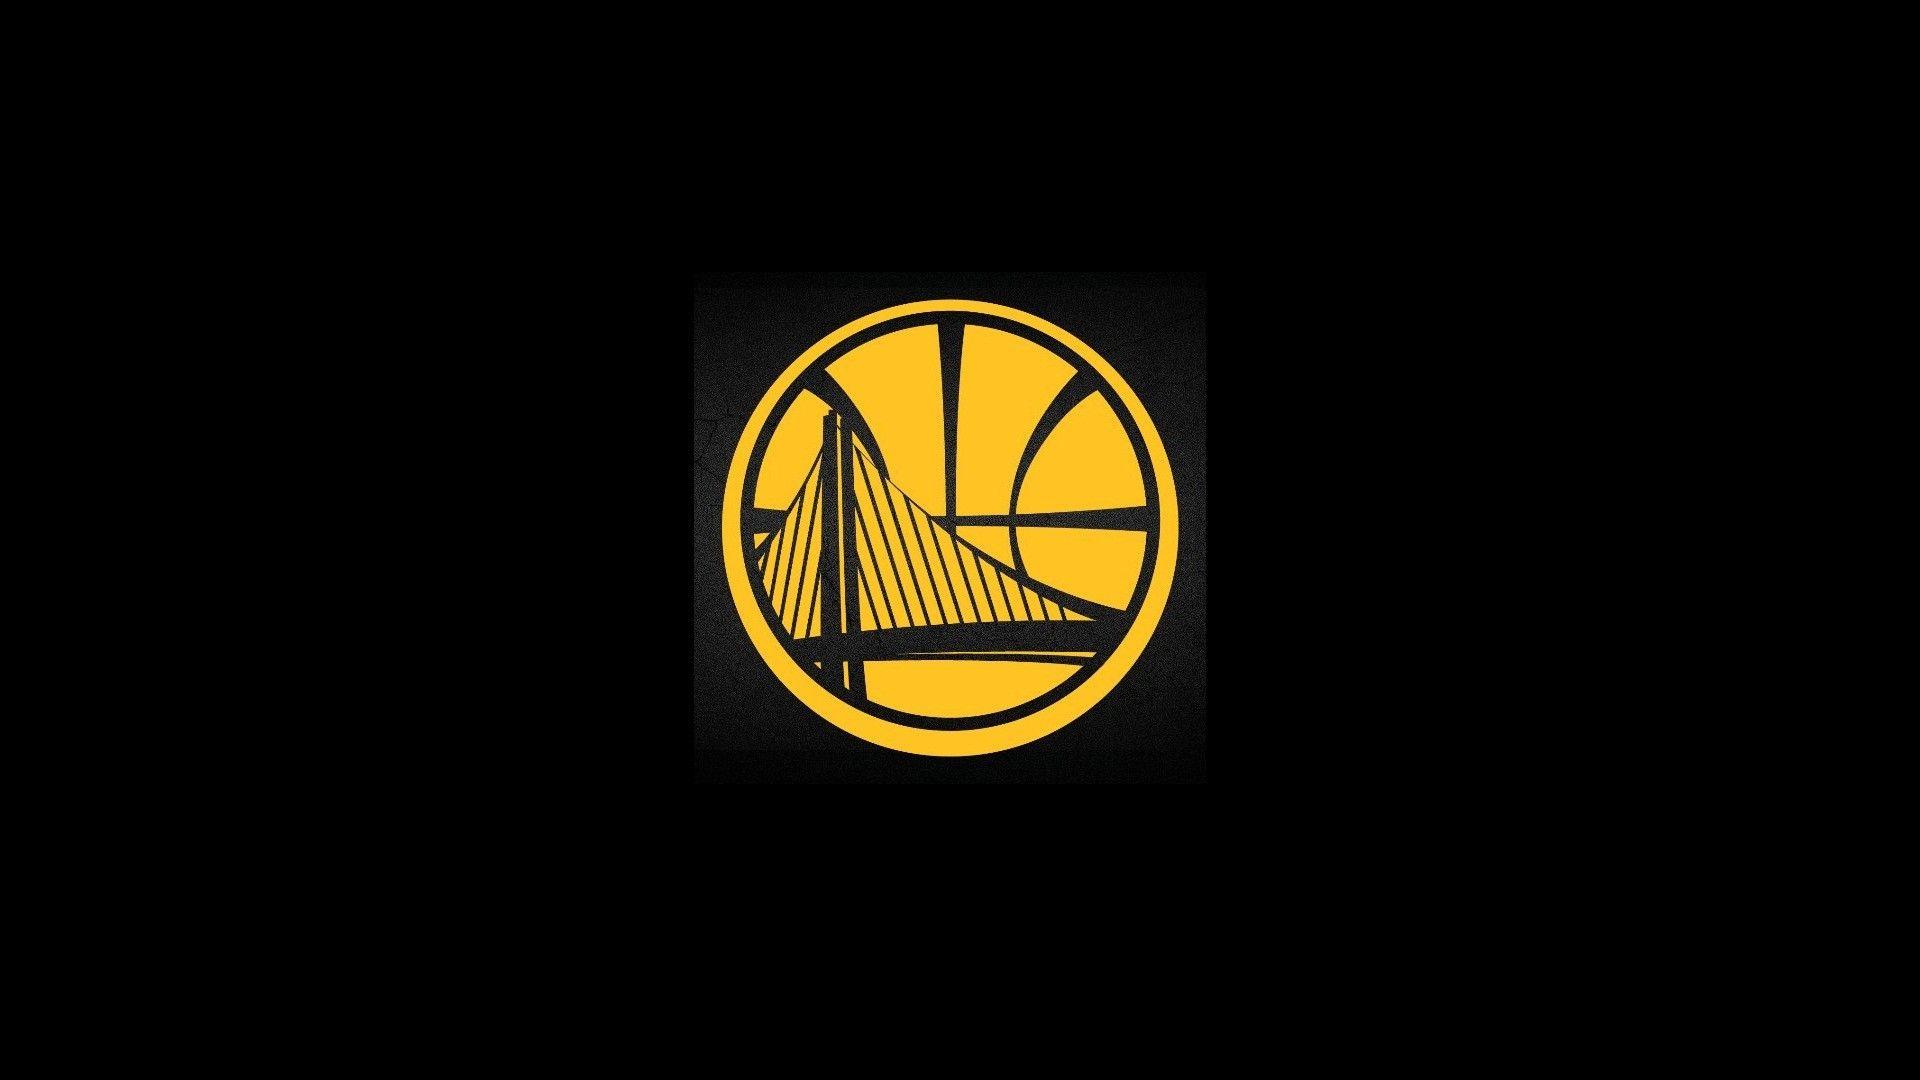 Hd Golden State Warriors Backgrounds 2020 Basketball Wallpaper Golden State Warriors Wallpaper Golden State Warriors Golden State Warriors Logo